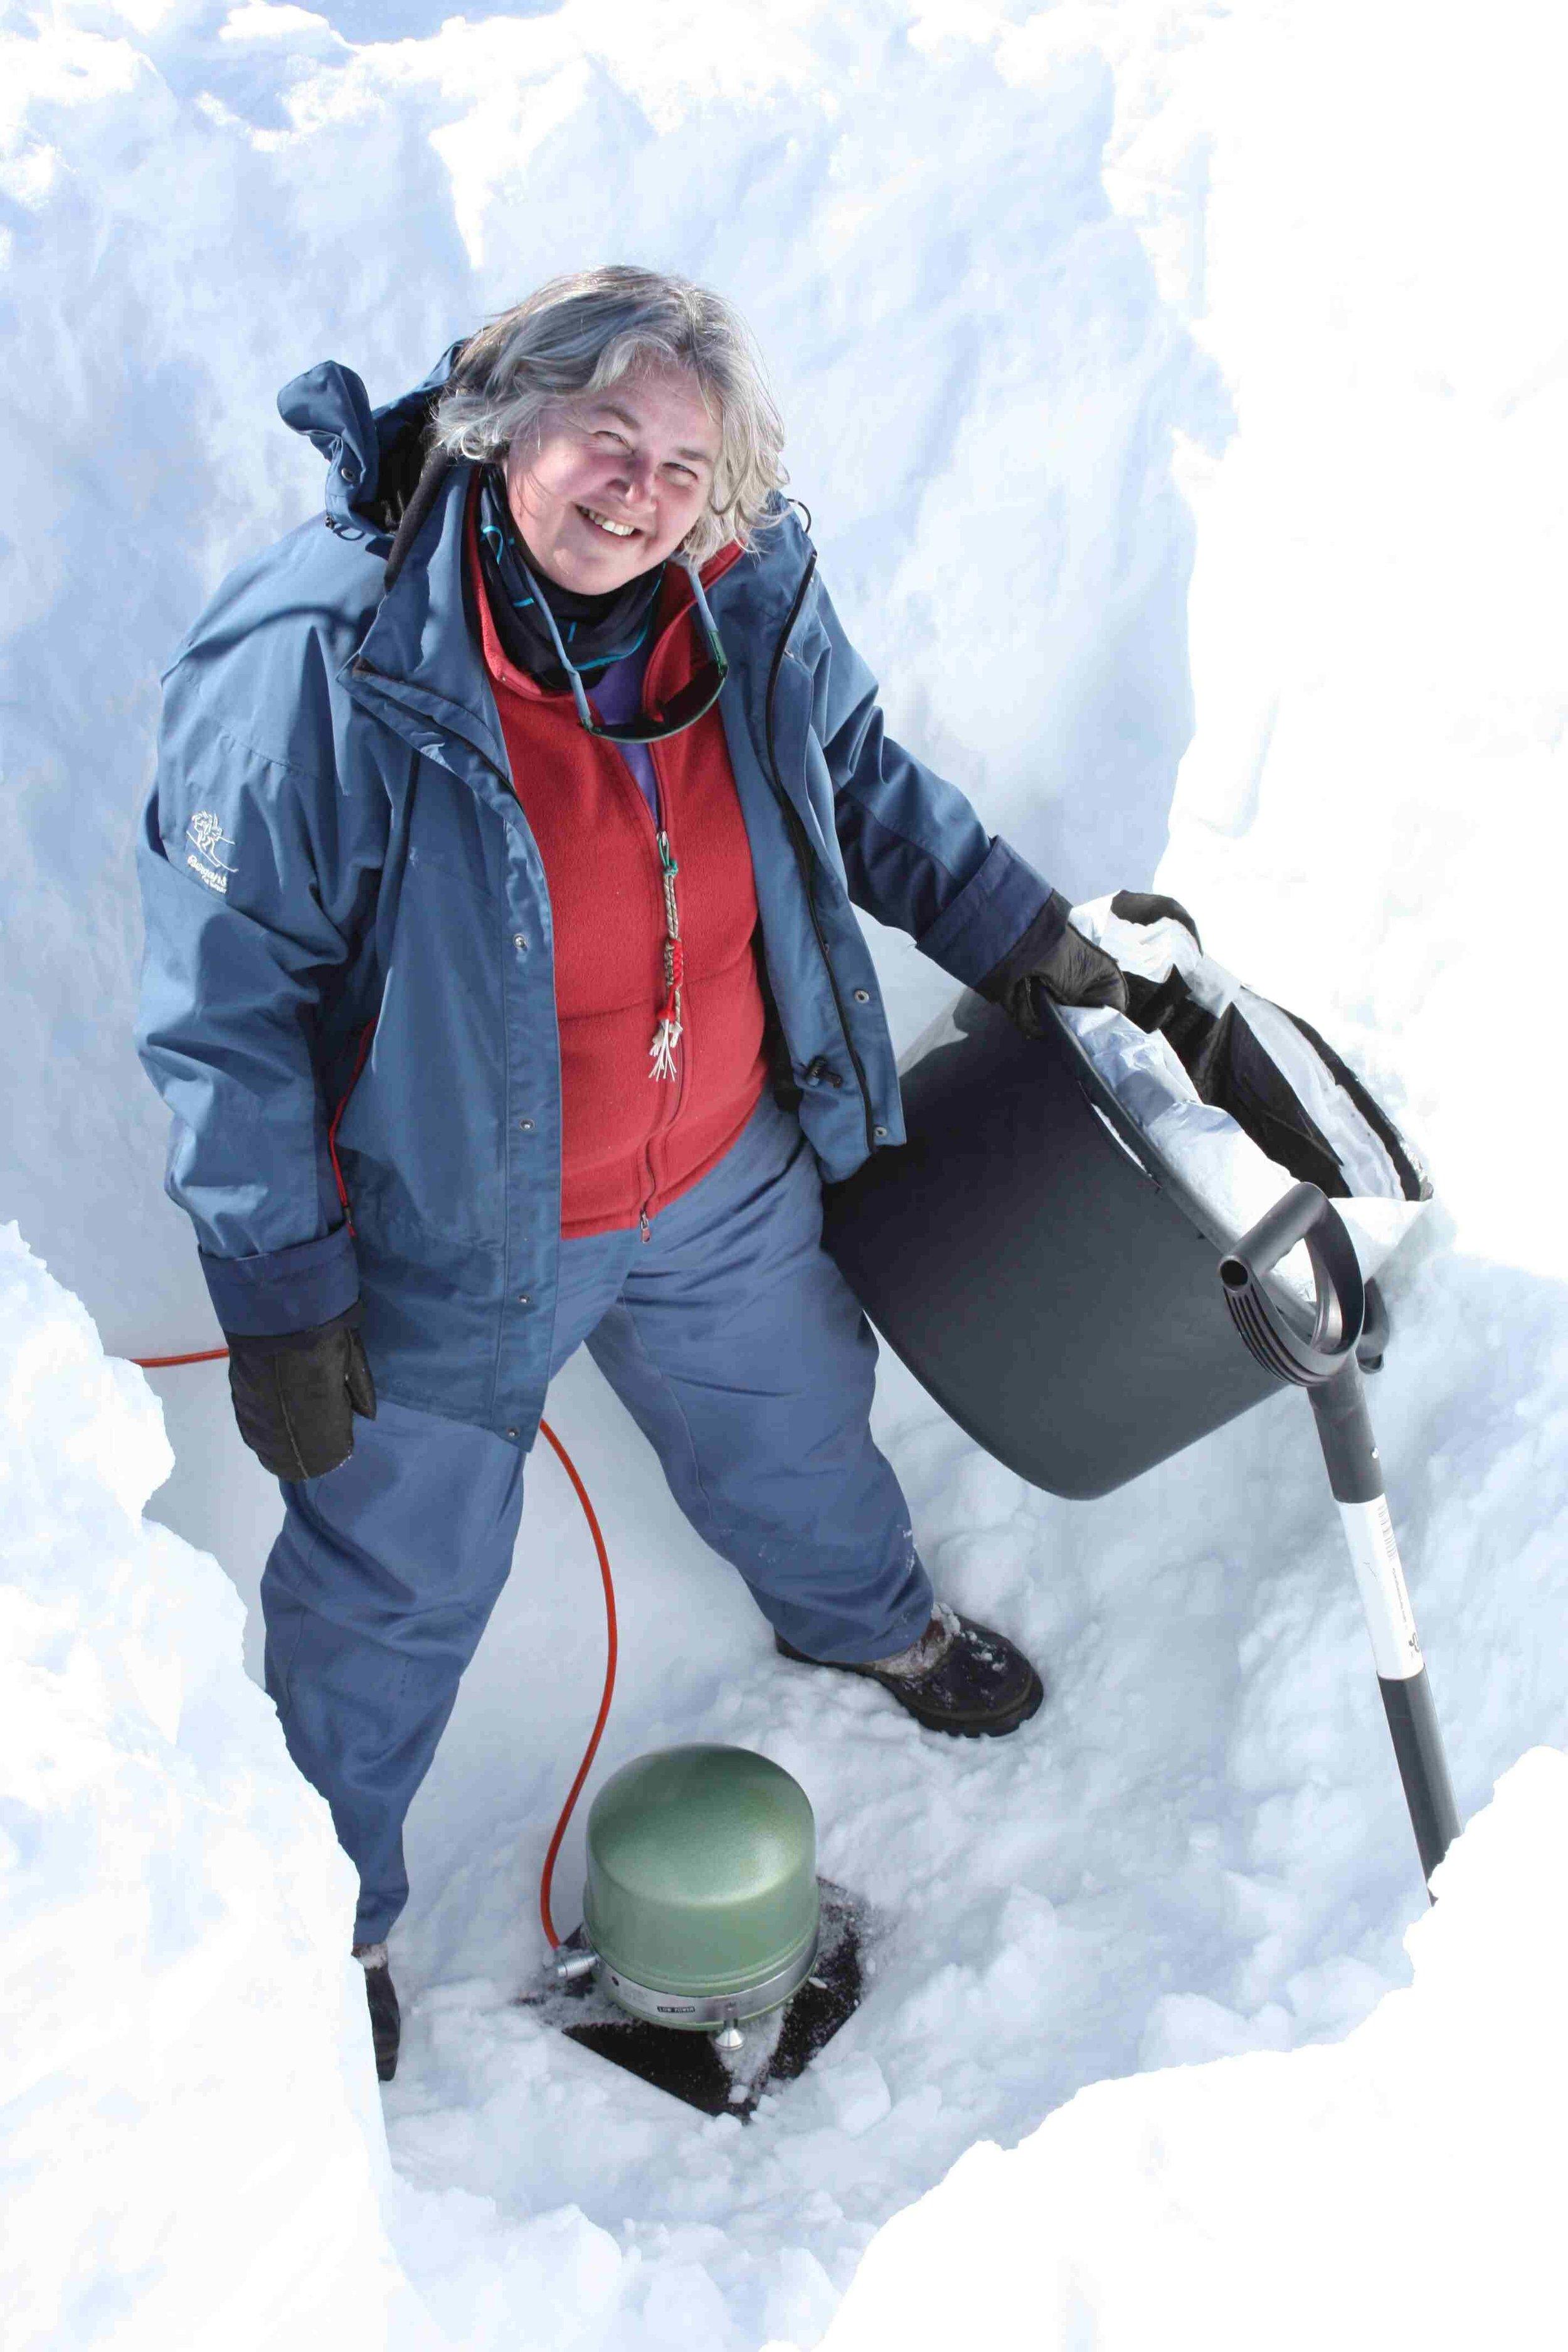 PI Trine Dahl-Jensen installing a seismometer, seen here at her feet.